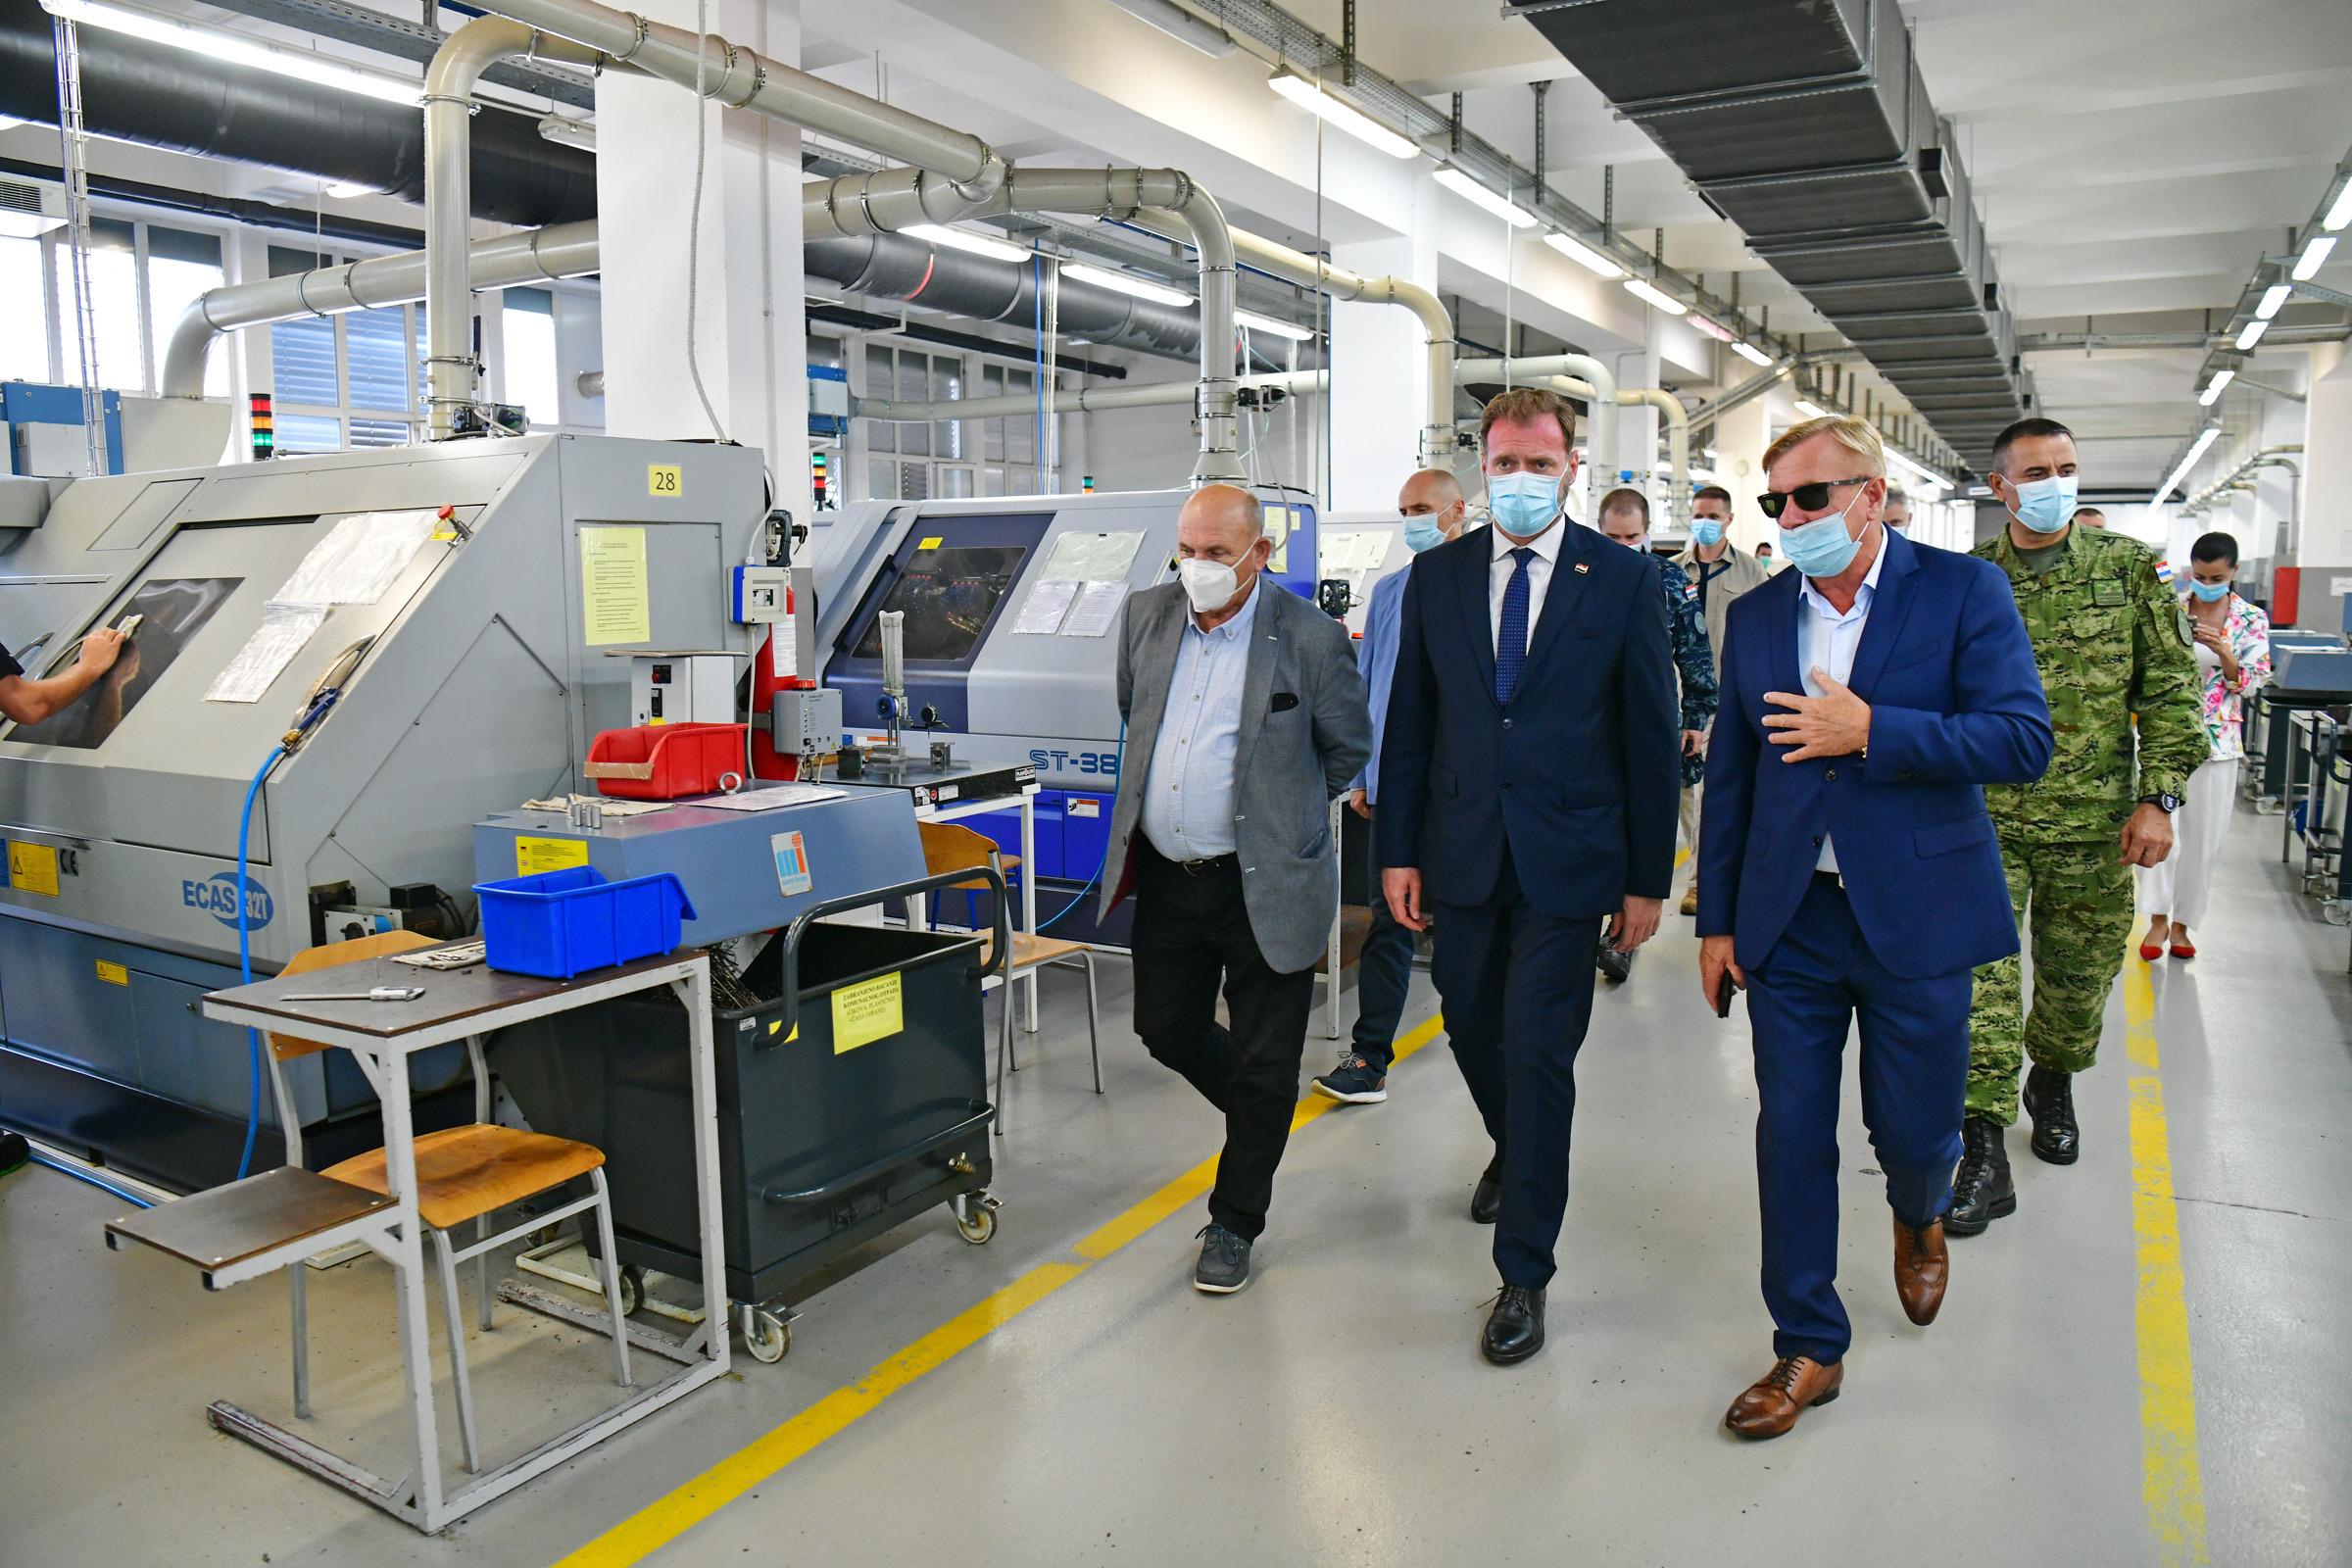 Ministar Banožić i načelnik GS OS RH admiral Hranj posjetili HS Produkt u Karlovcu